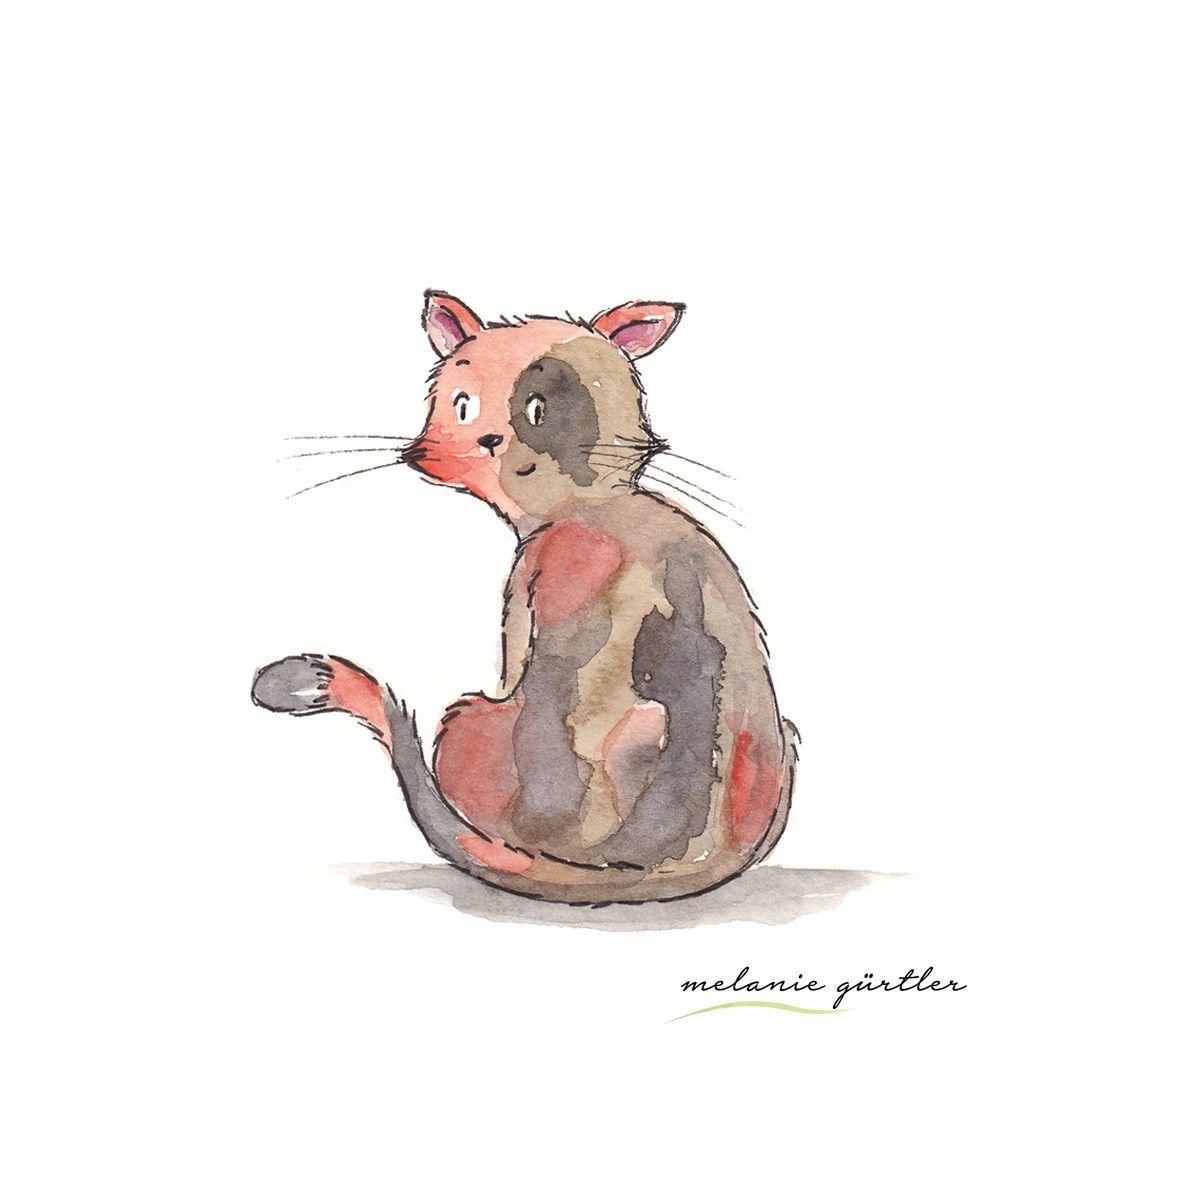 Bunte Katze Aquarell Kinderbuch Melanie Gurtler Illustration